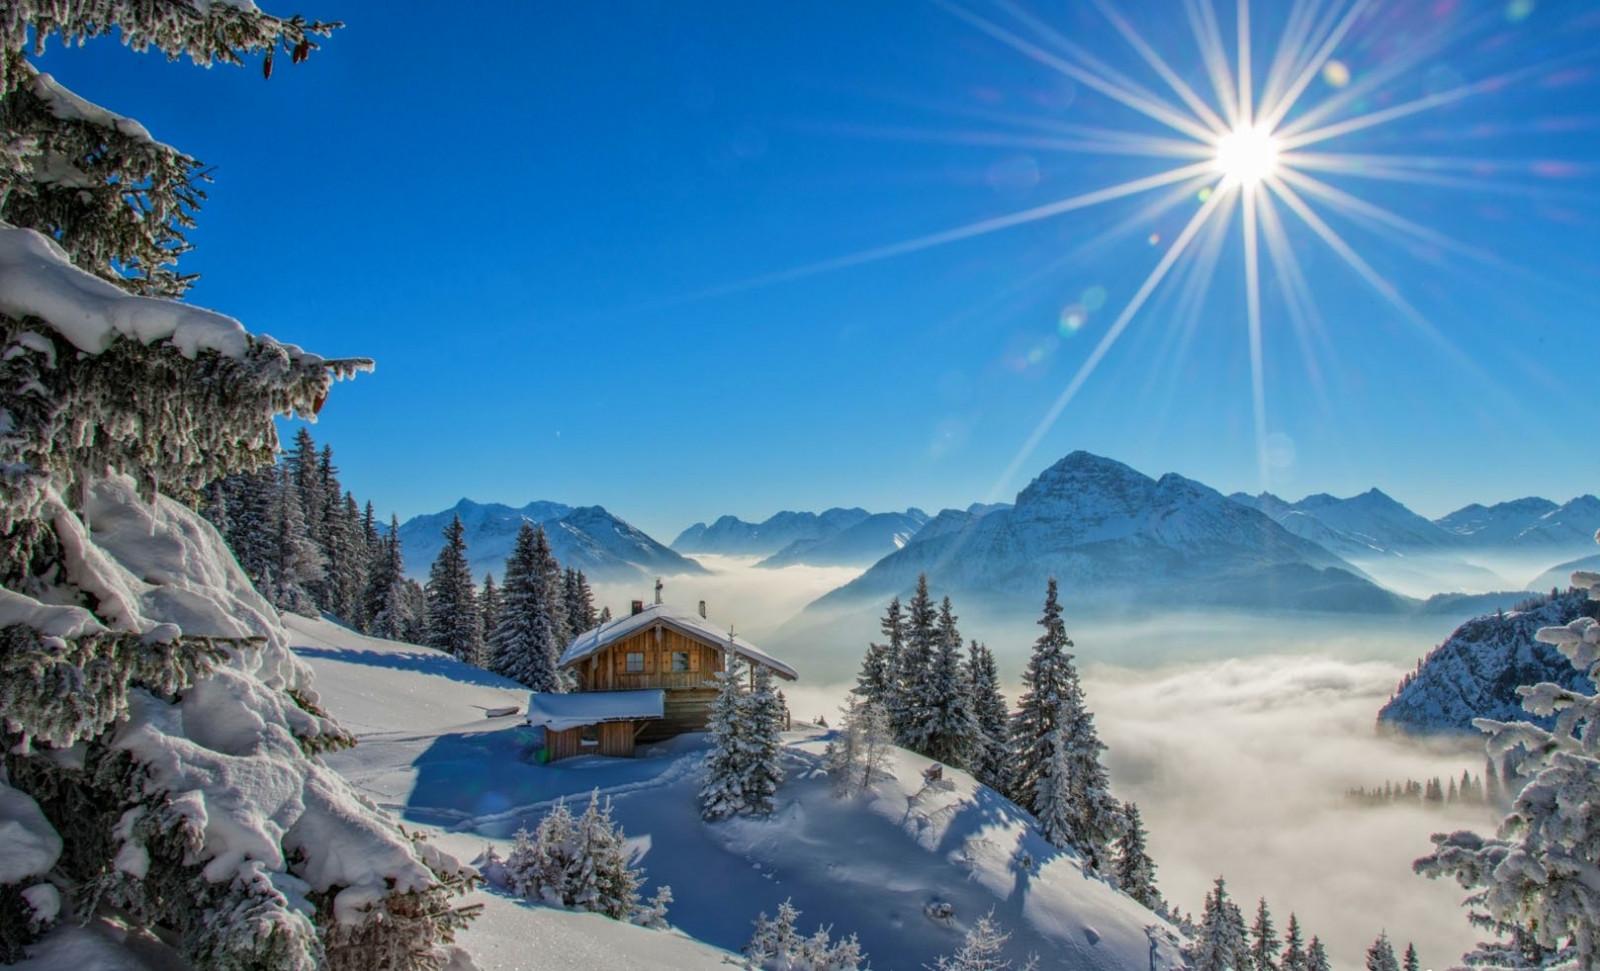 Wallpaper : landscape, forest, mountains, nature, snow, winter, blue, snowy peak, sun rays, Alps ...